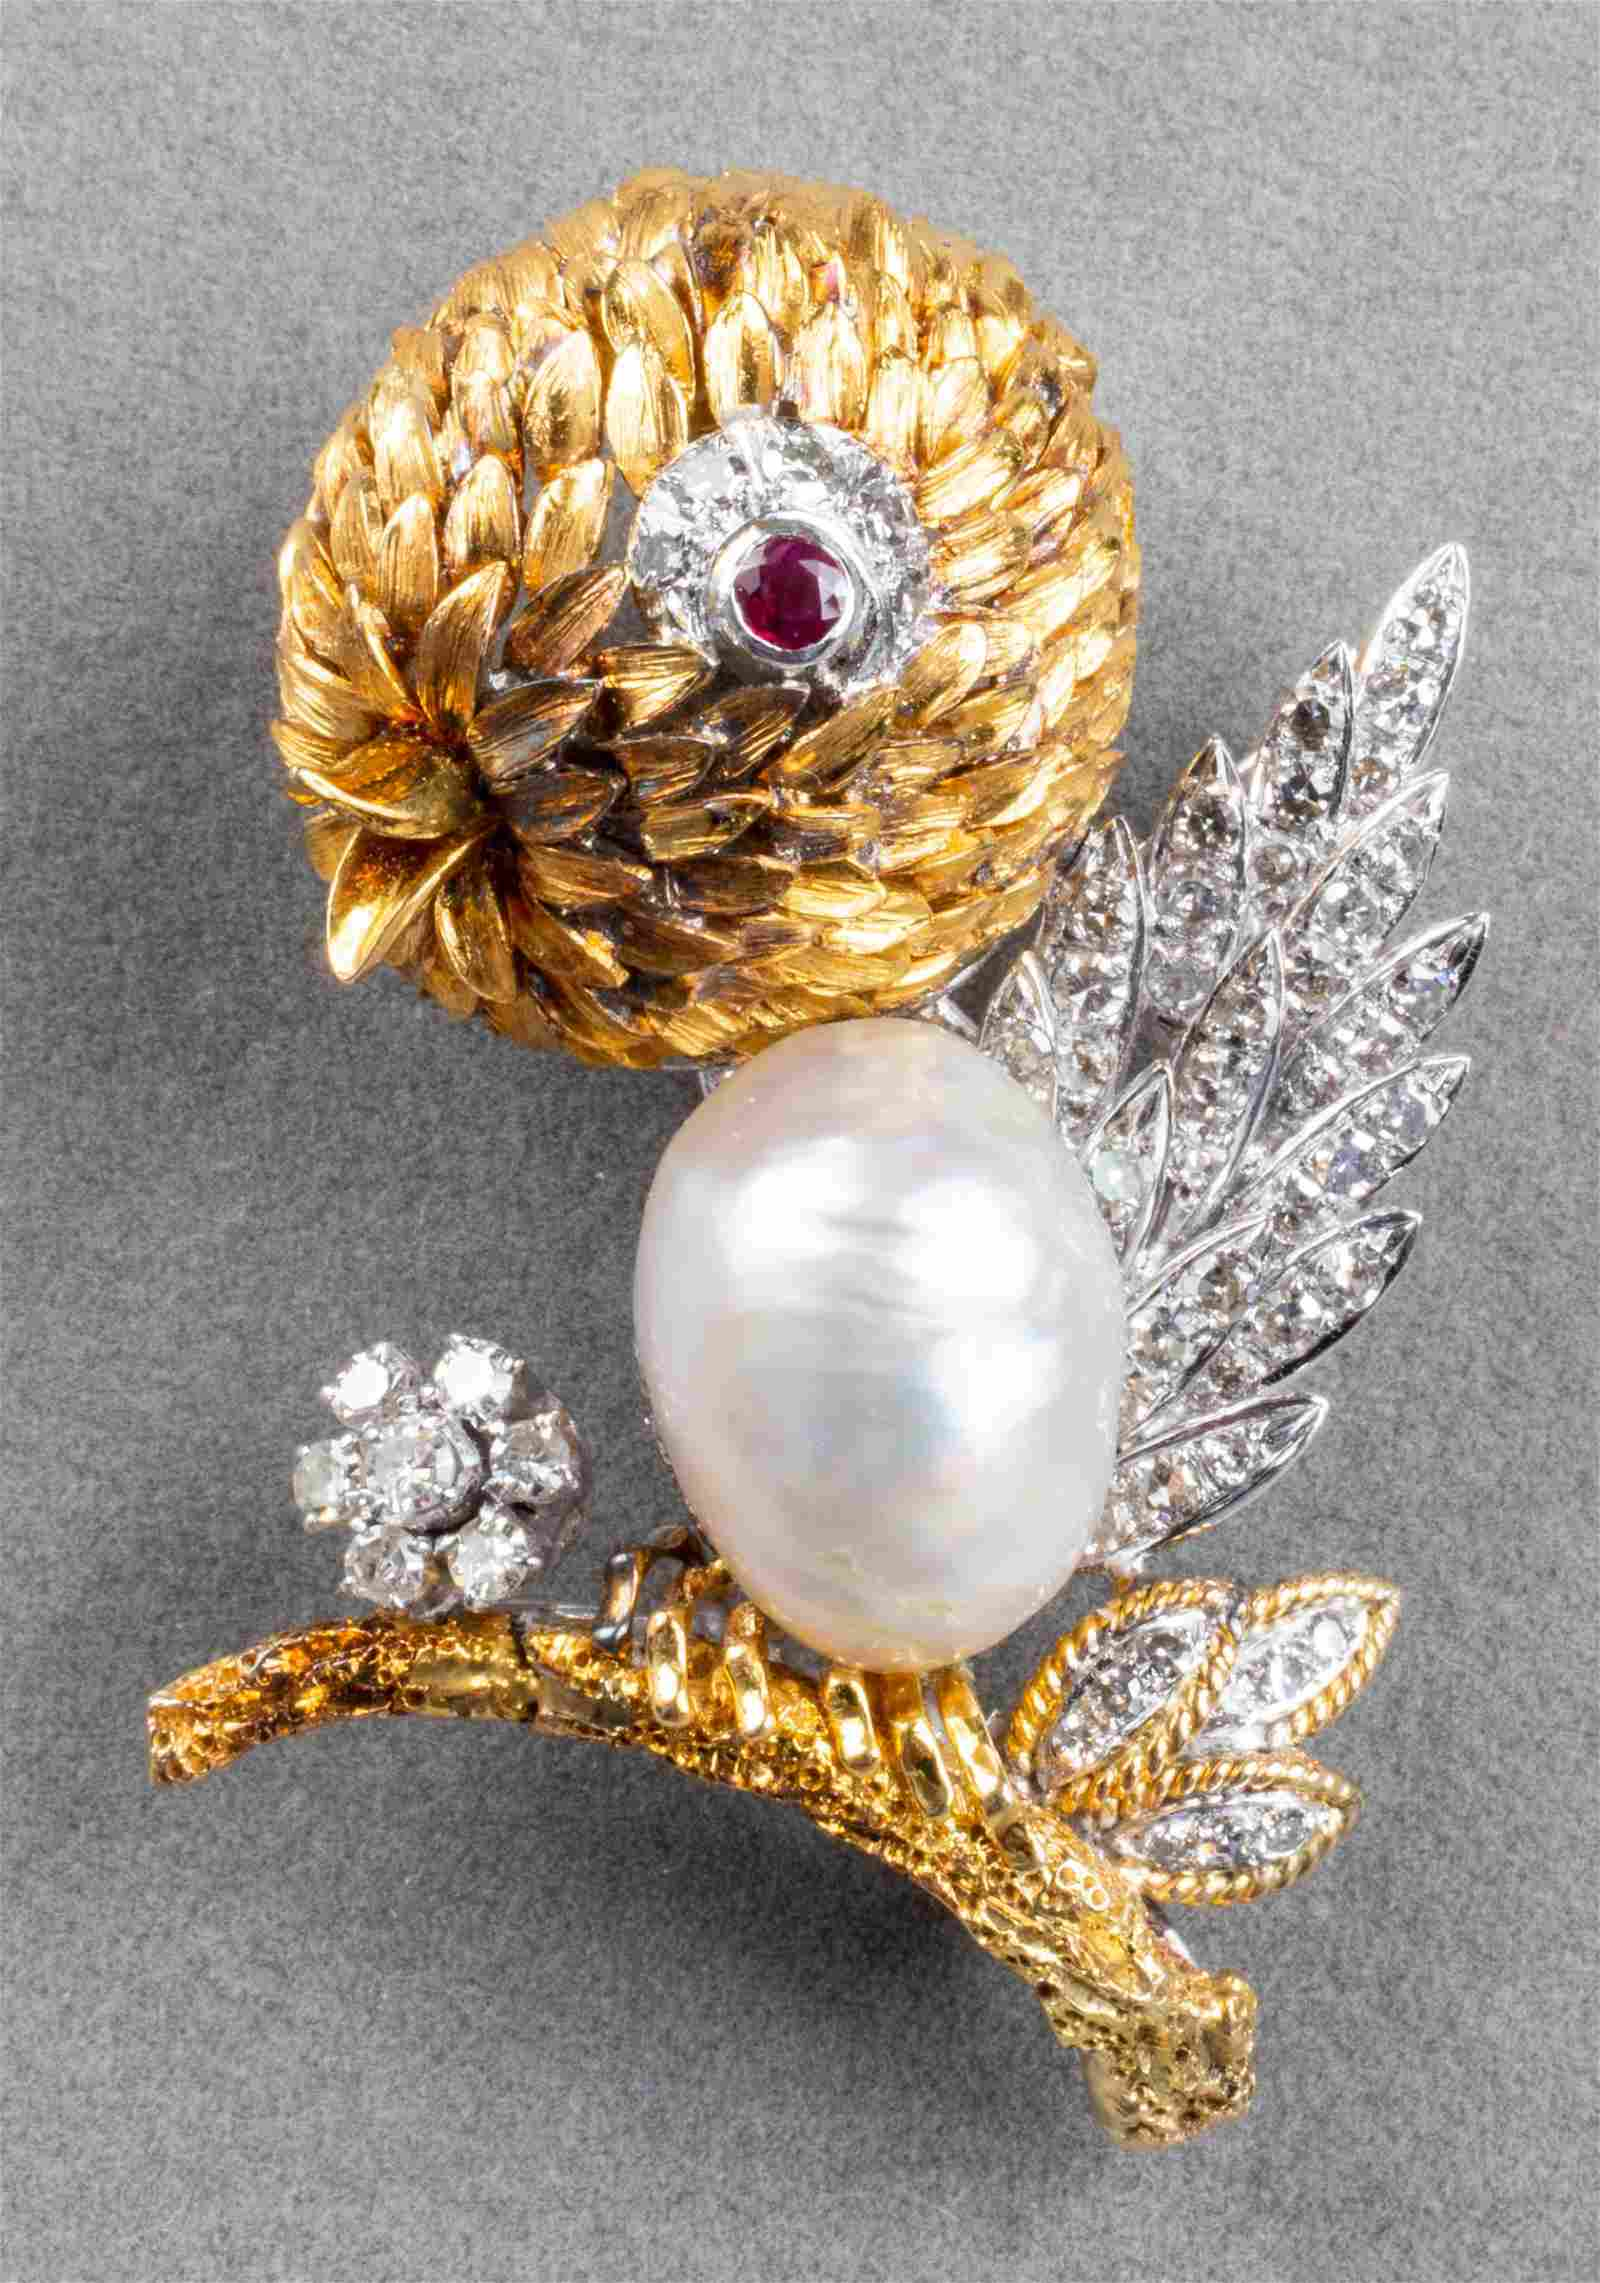 Vintage 18K Gold Diamond, Pearl & Ruby Bird Brooch